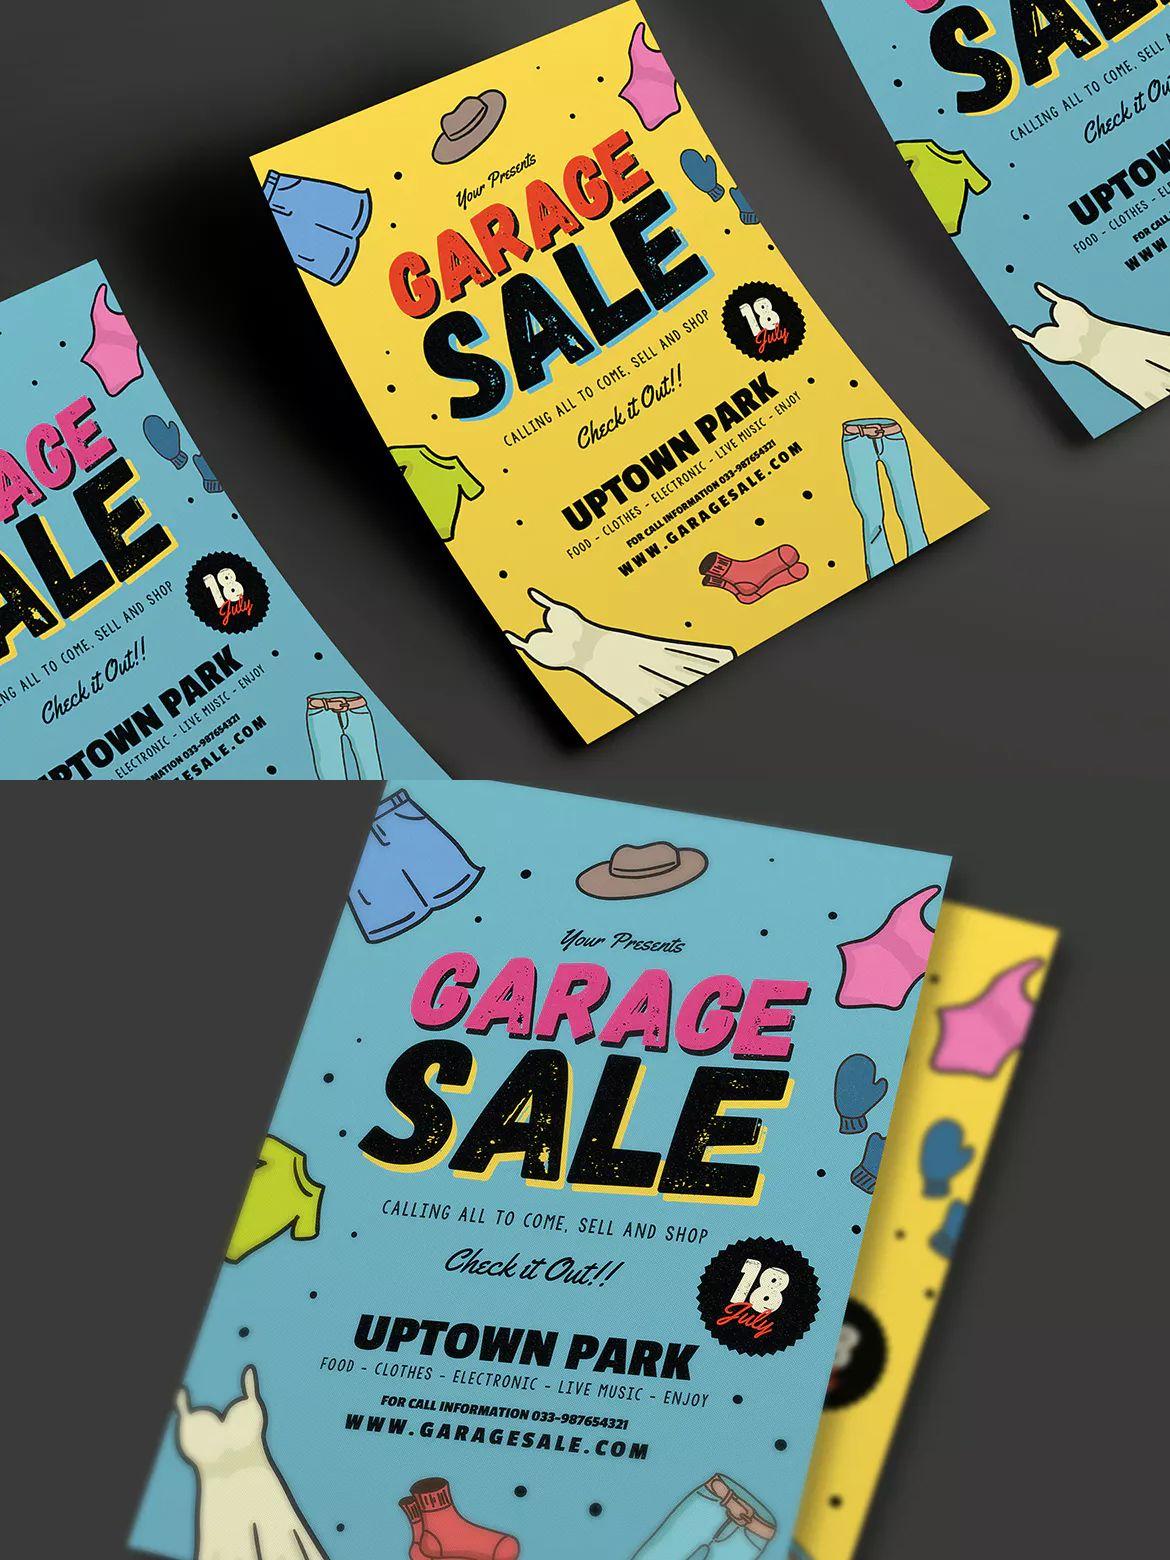 retro garage sale flyer template ai psd a4 unlimiteddownloads